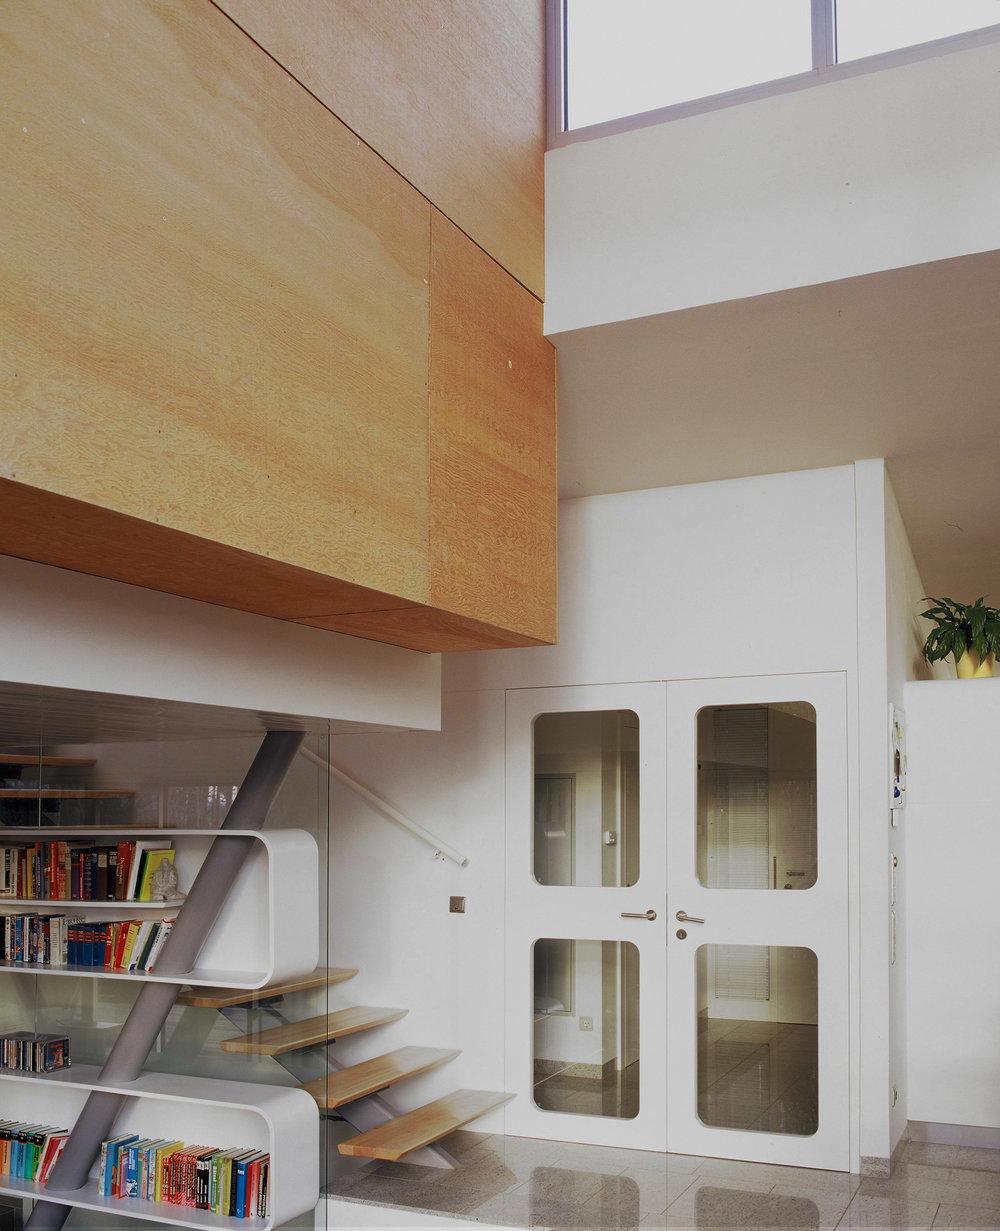 A01 architects - Residence Eiser_(c) Nadine Blanchard__web06.jpg